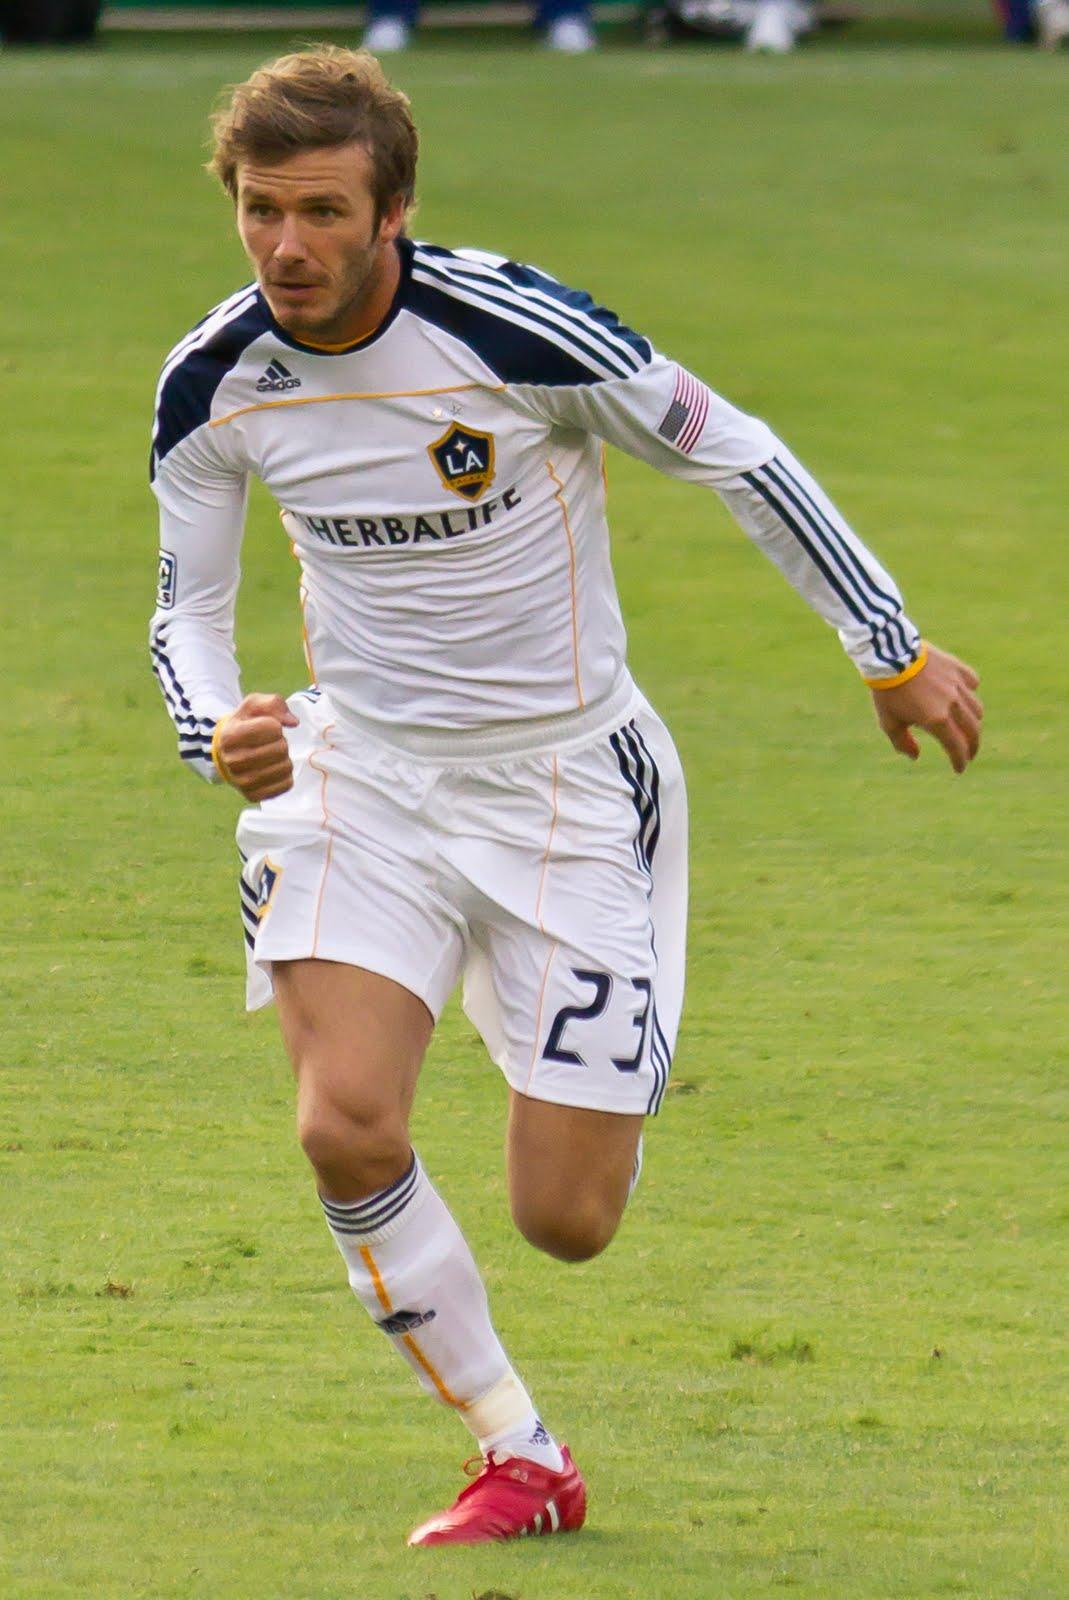 David Beckham Playing Soccer For England Pro Soccer: David Beck...